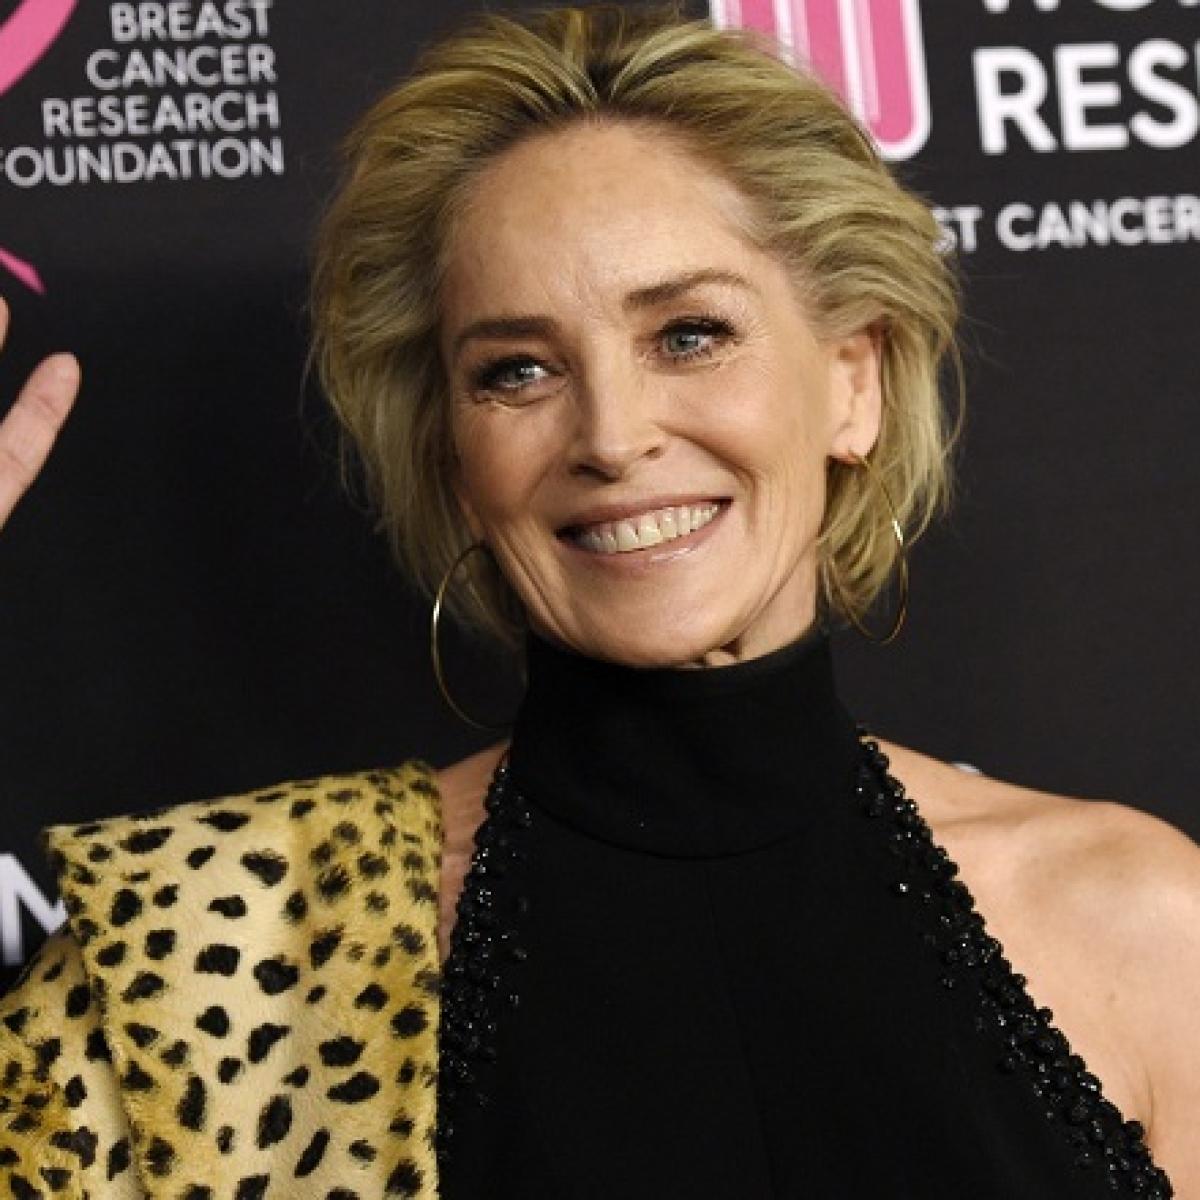 Sharon Stone's unwind therapy: Good bath, yoga, colouring books